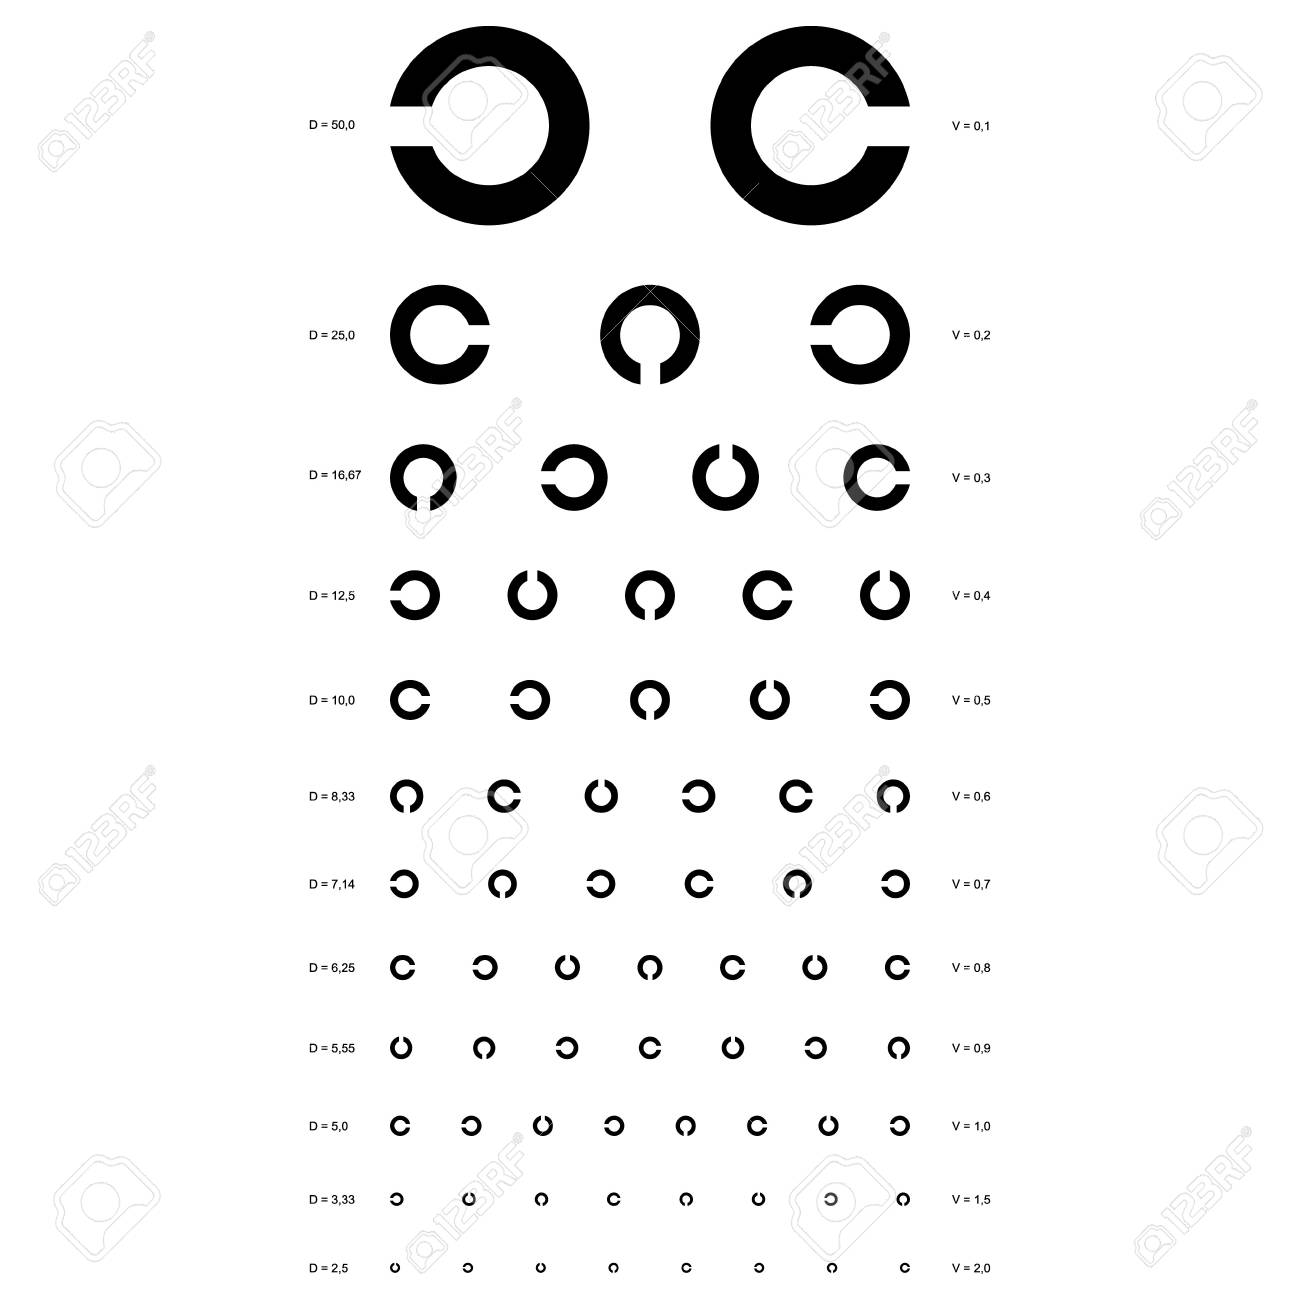 523c689aeb7 Vector eye test chart visual acuity lizenzfrei nutzbare standard eye test  jpg 1300x1300 Standard eye test